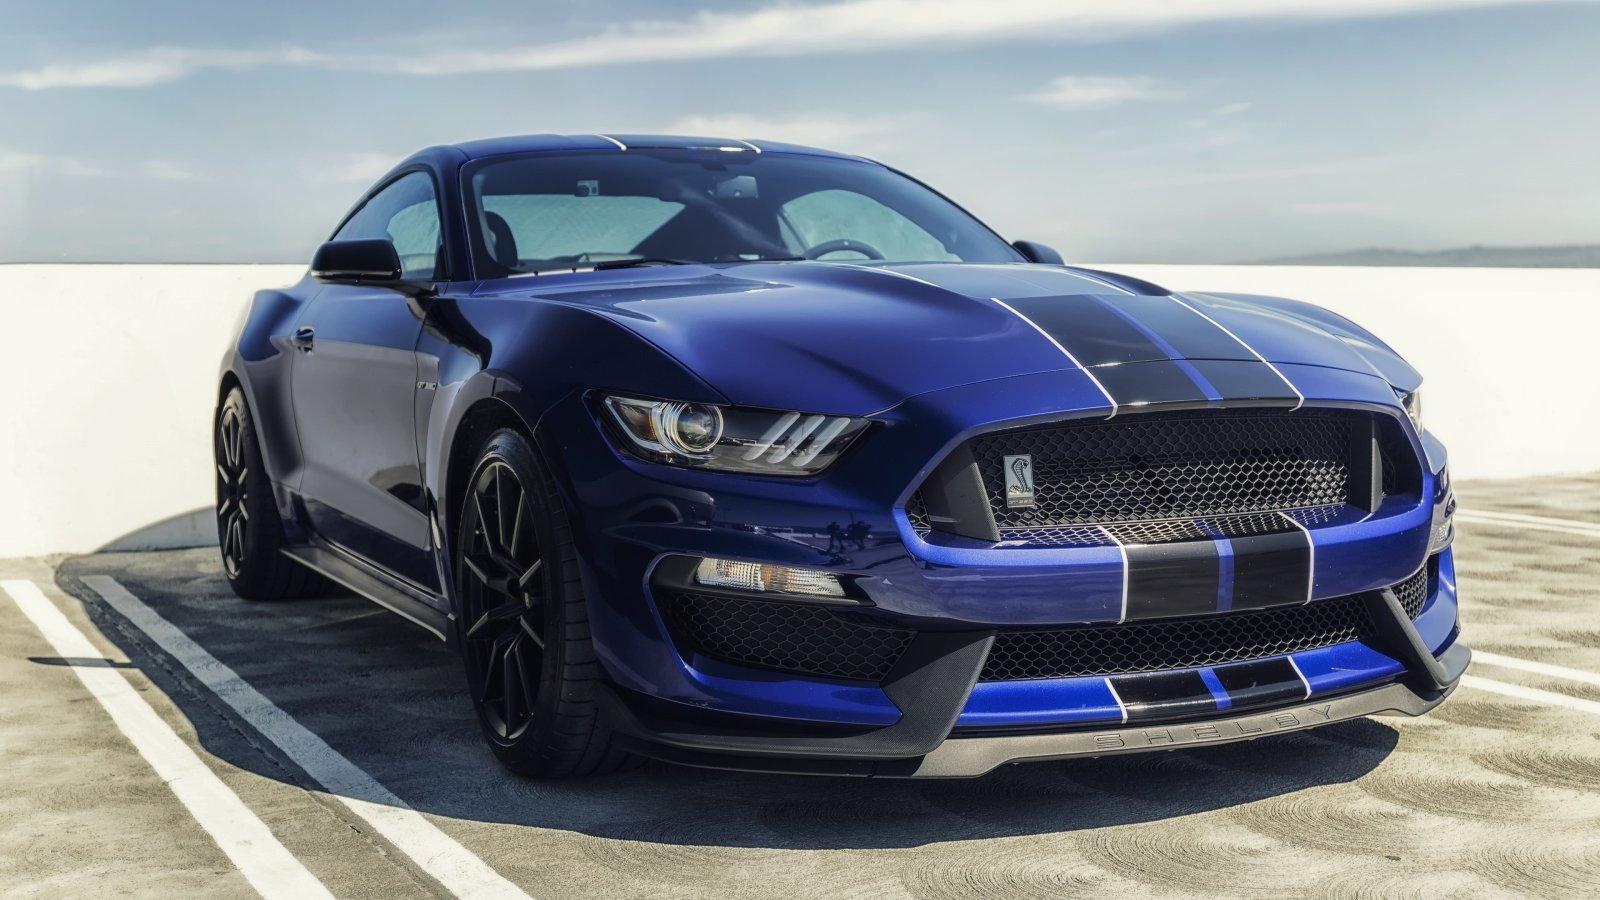 Slideshow 1 000 Hp Shelby Mustang Isn T Allowed Near Children Themustangsource